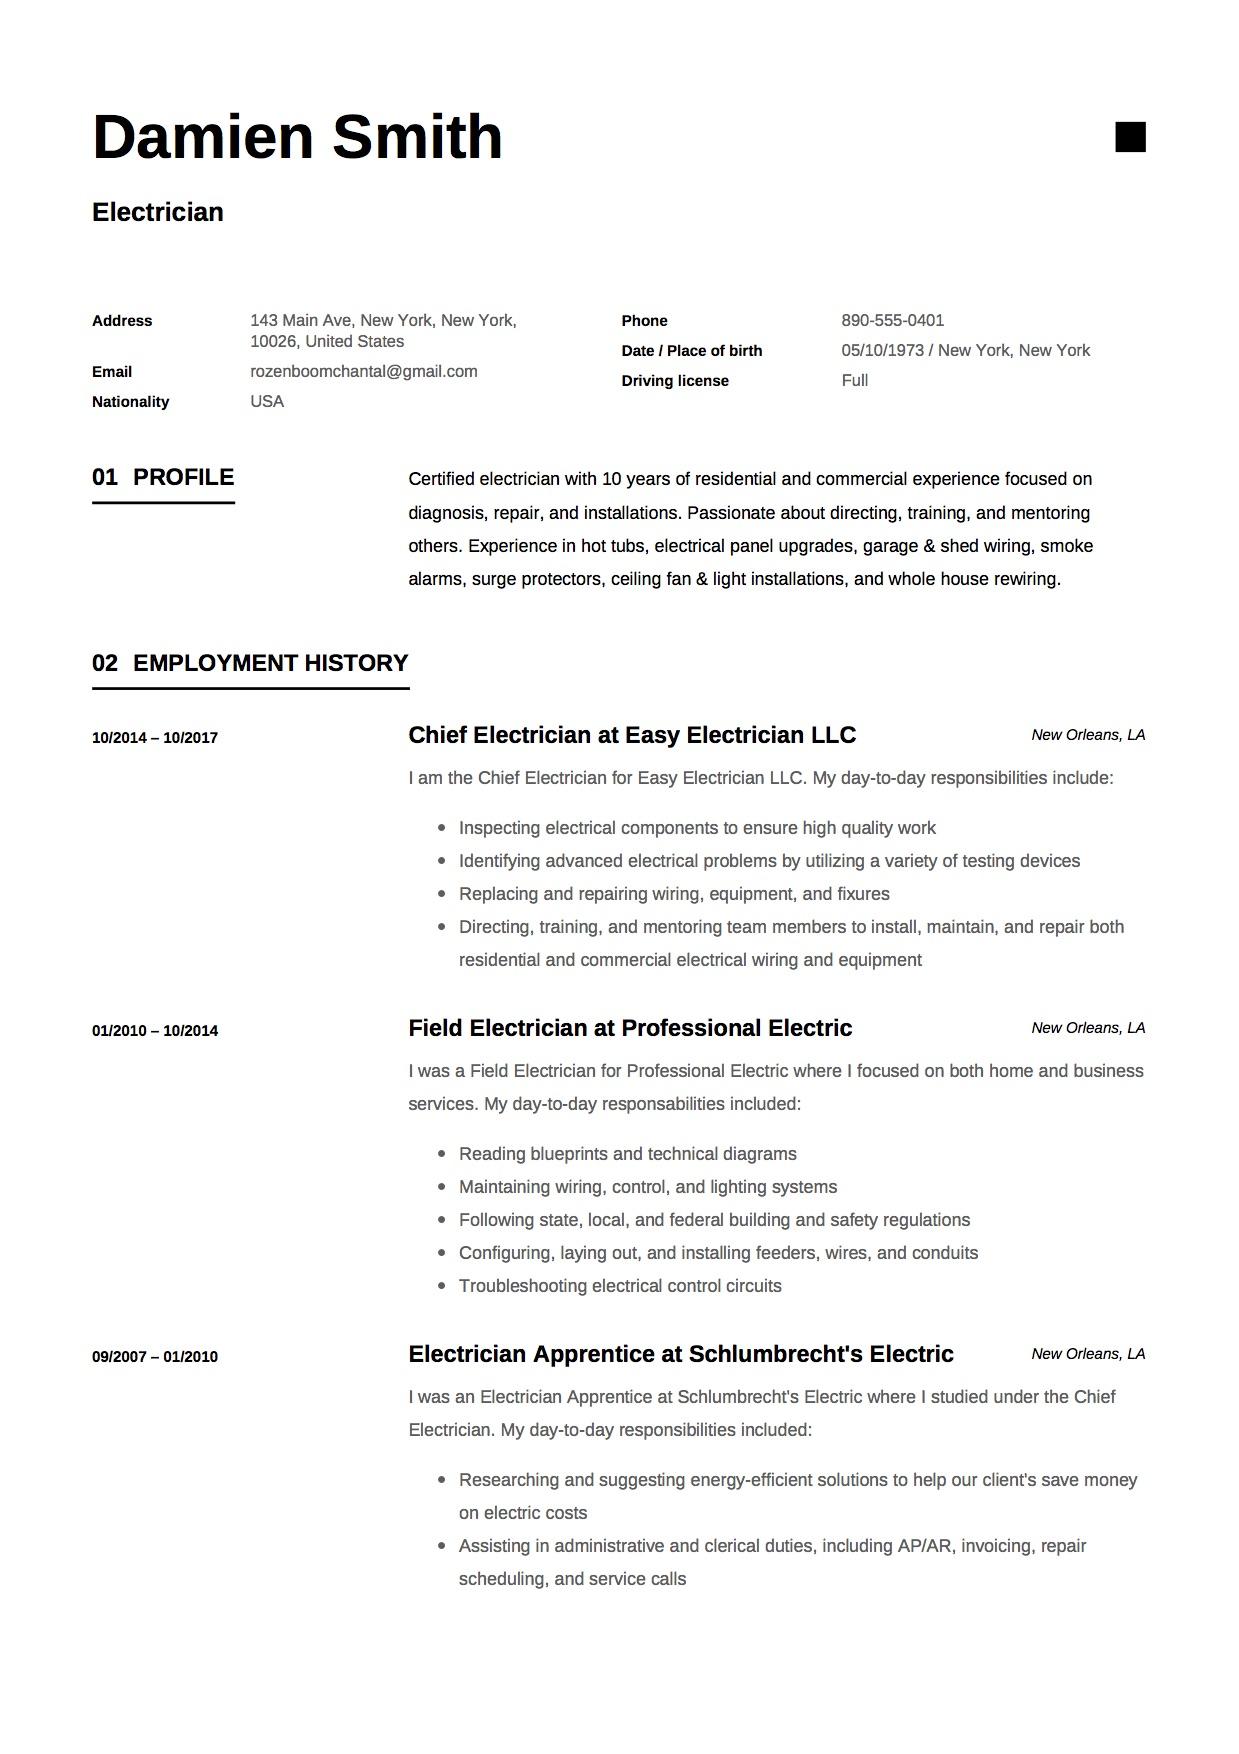 Curriculum Vitae For Electrician